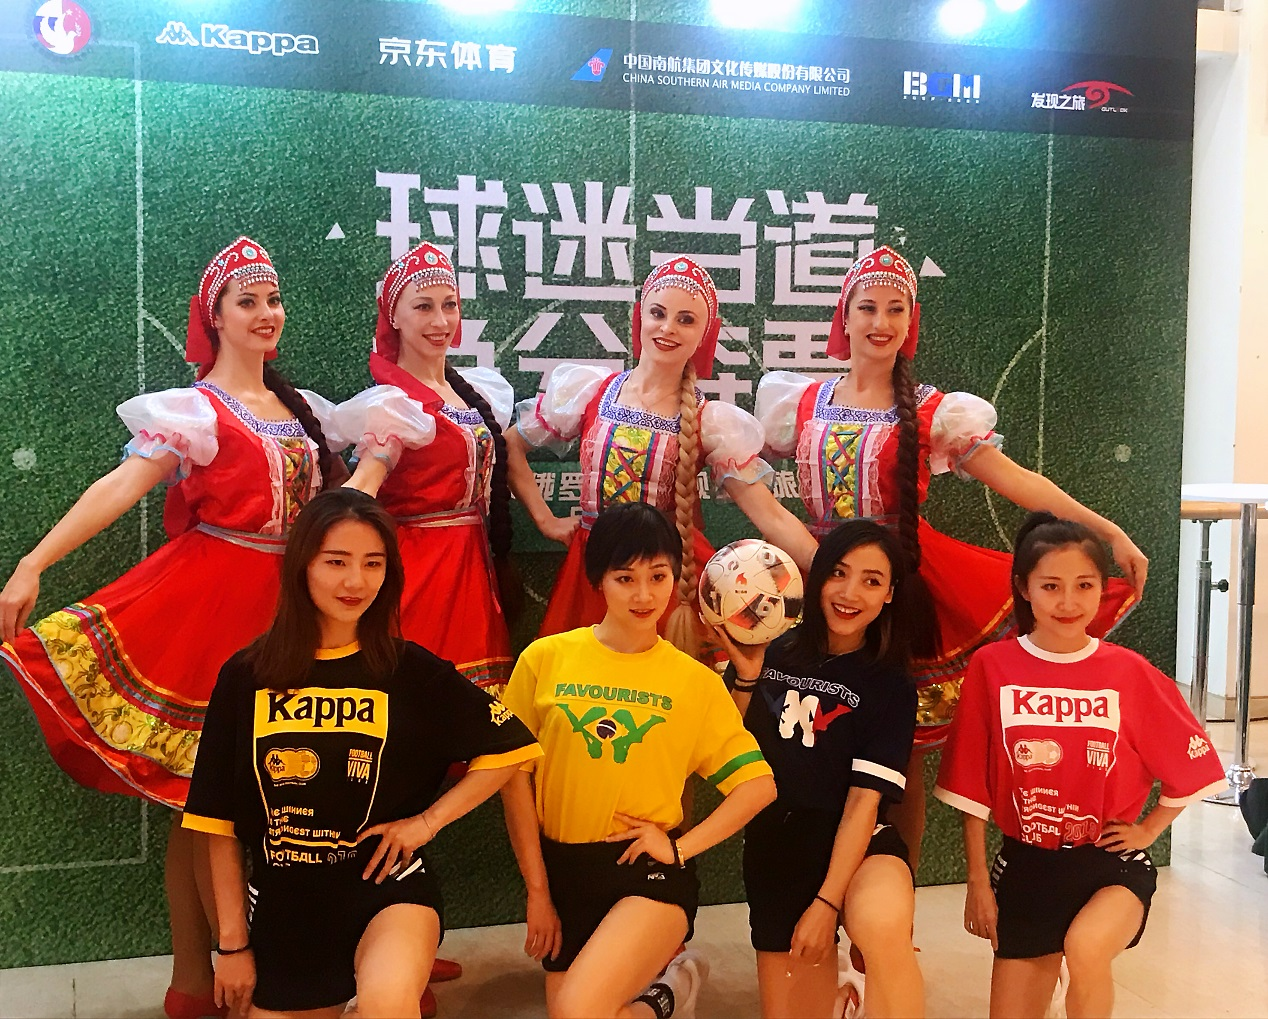 KAPPA携手南航传媒、京东体育共筑俄罗斯观赛之旅